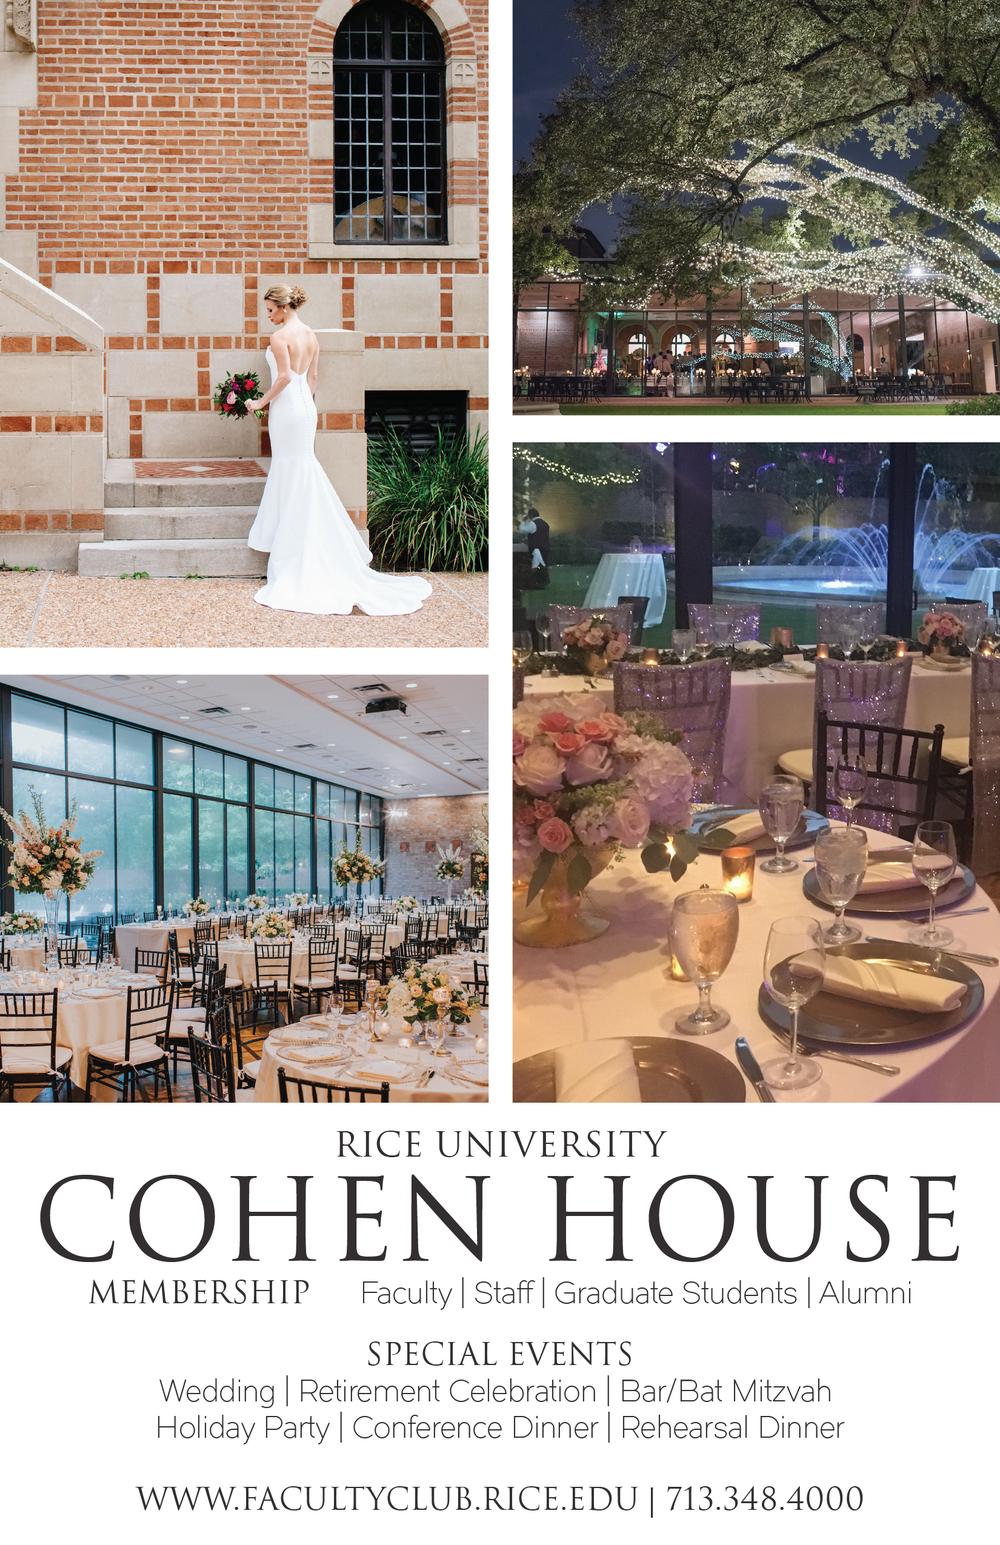 CohenHouse-OneSided-01.png